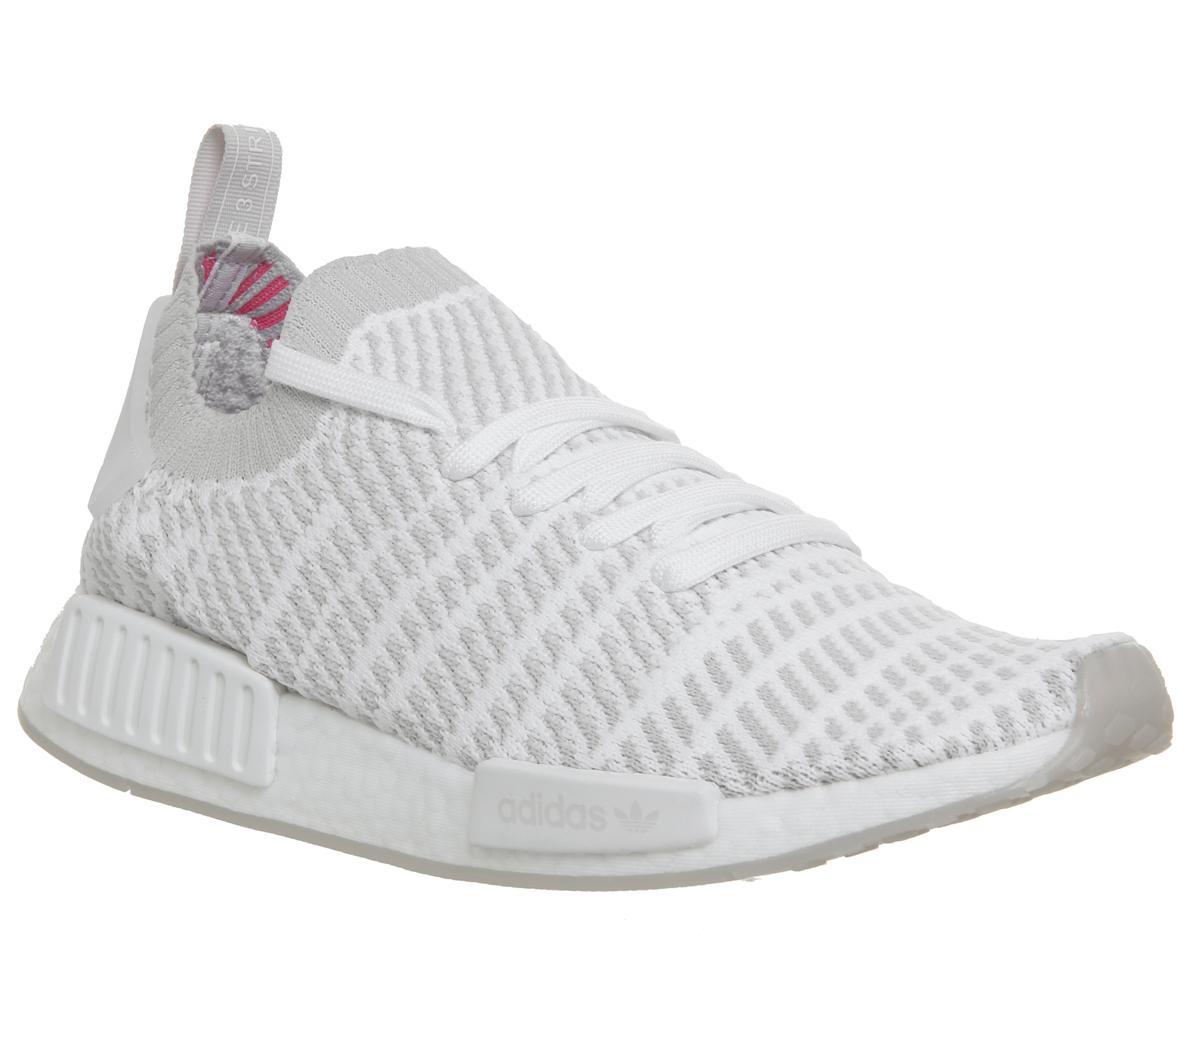 Adidas NMD R1 Grey Pink   Airfrov